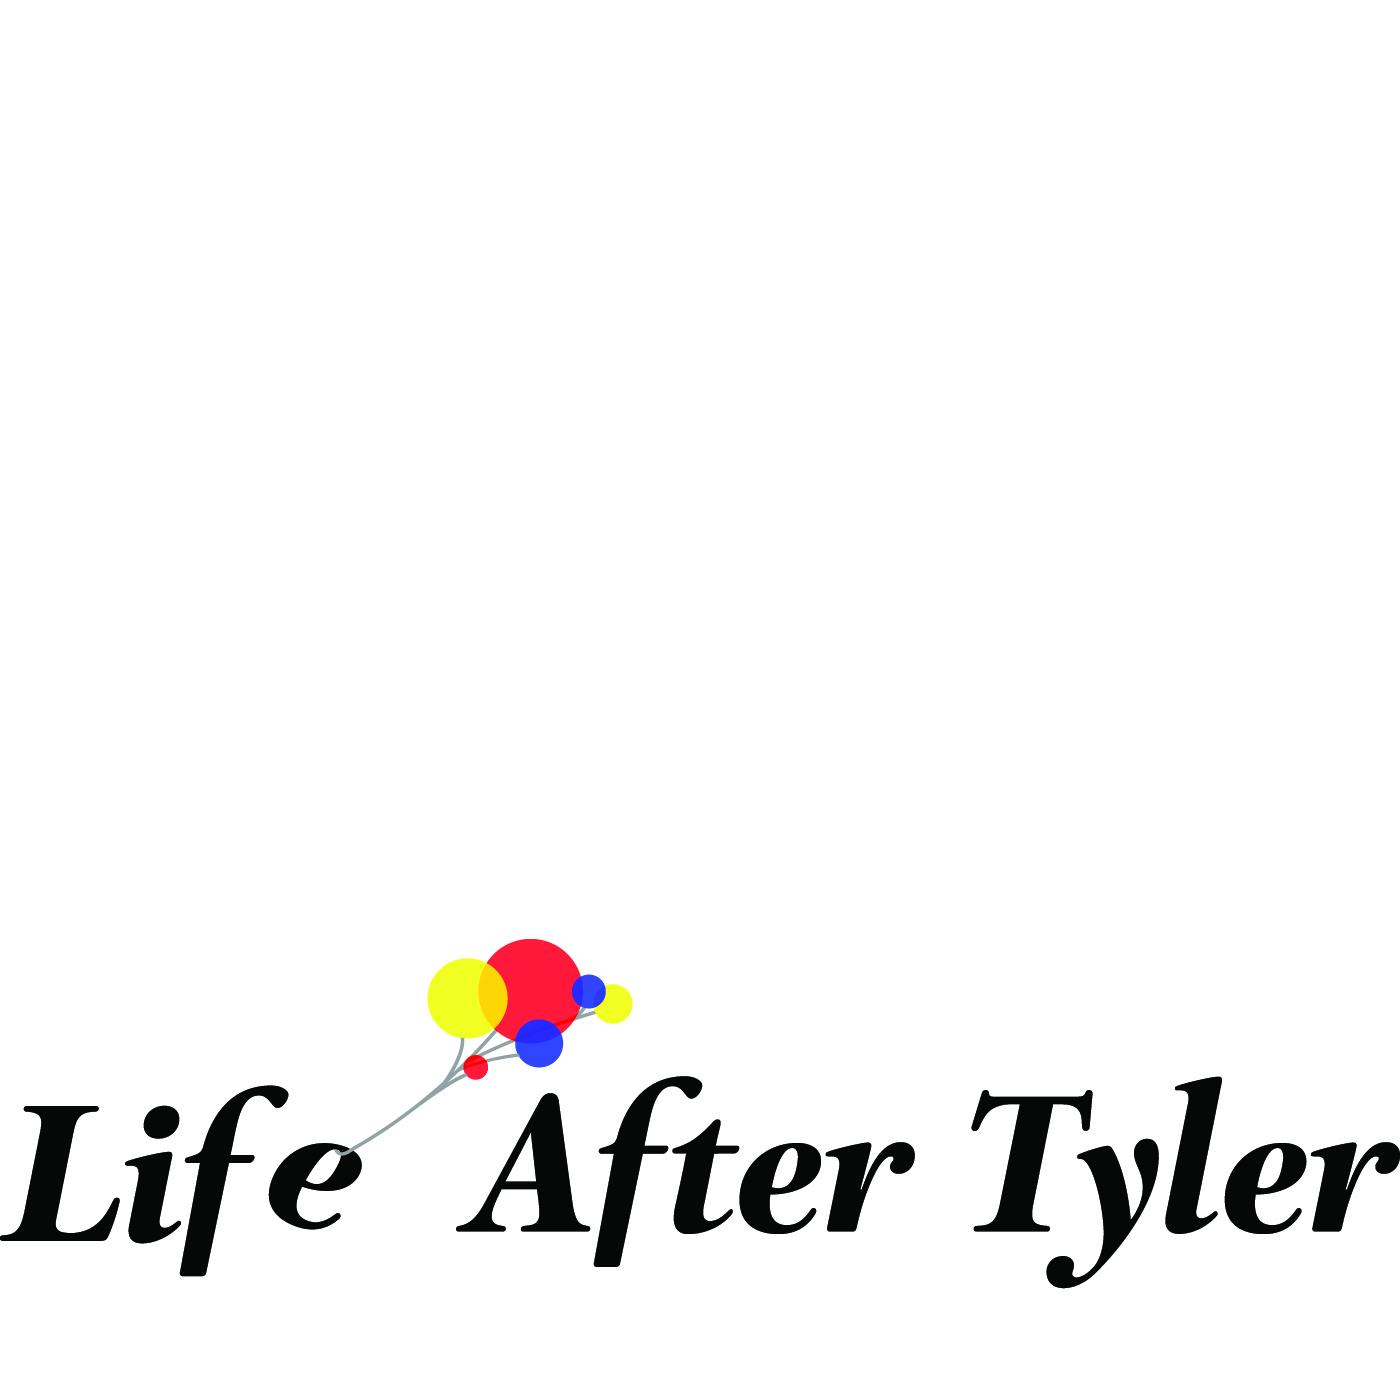 Tyler School of Art's Life After Tyler podcasts show art